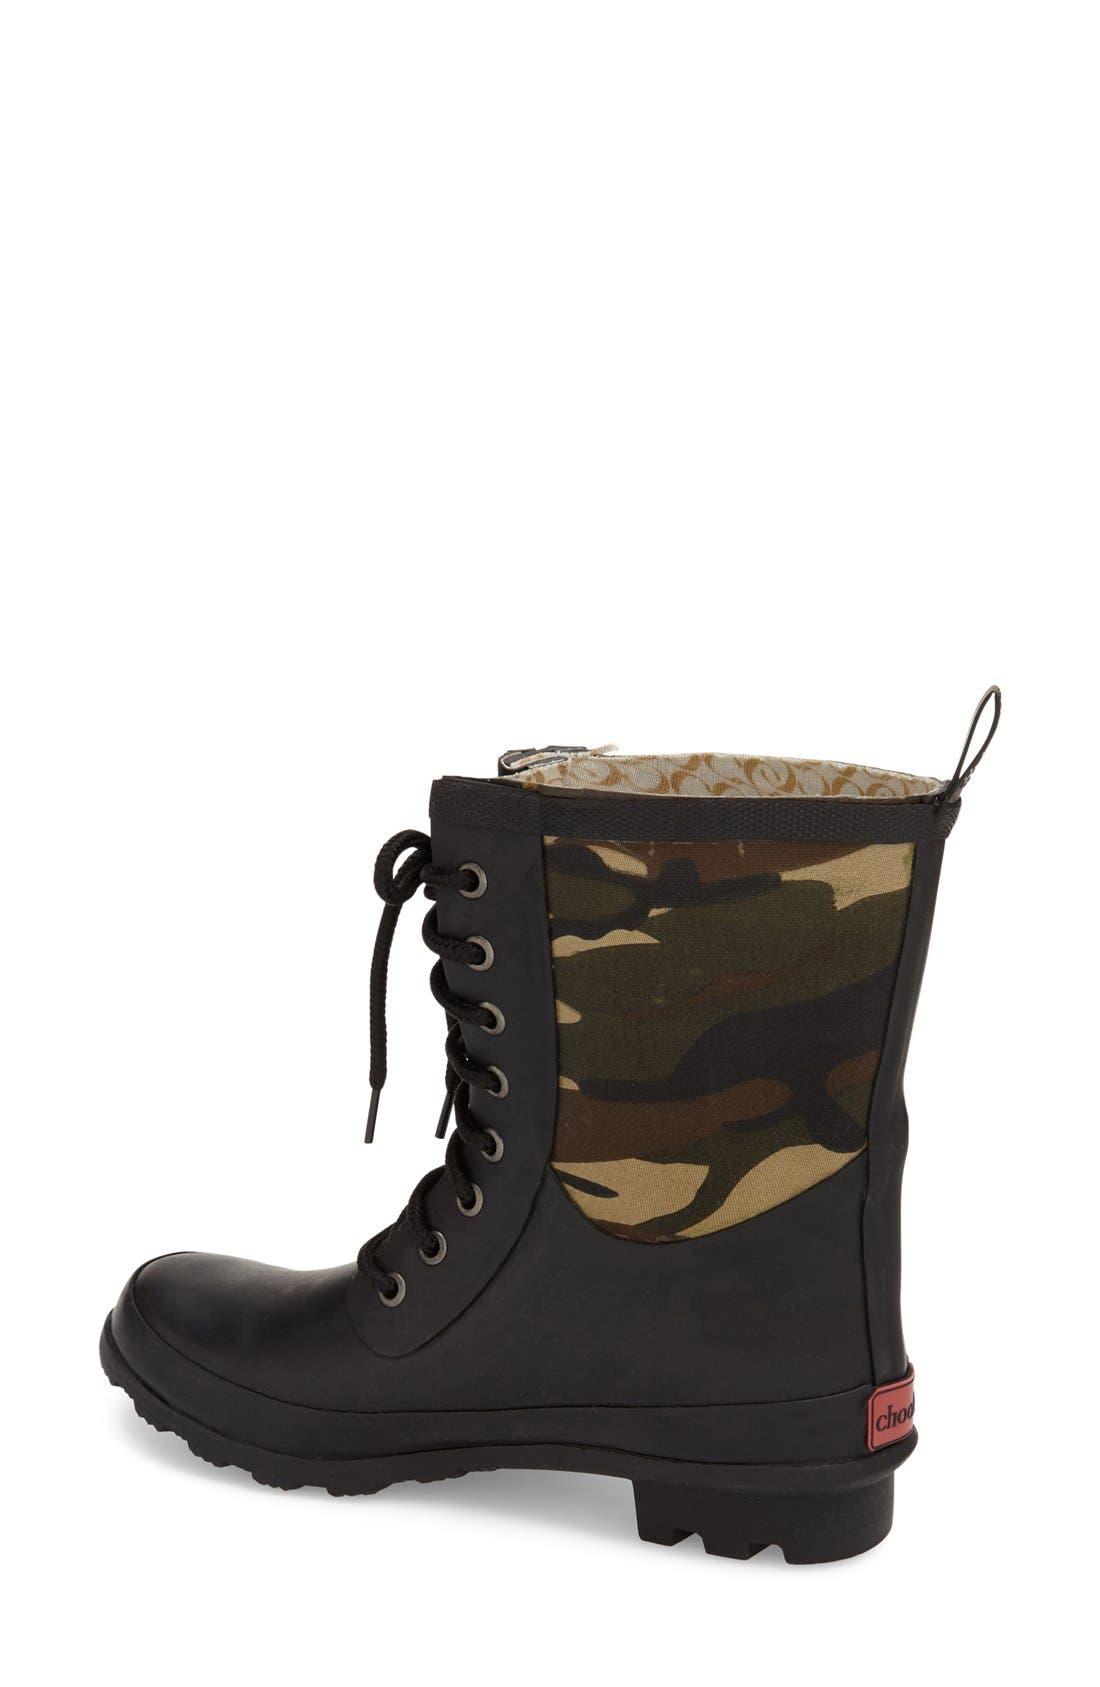 Alternate Image 2  - Chooka 'Cara' Mid High Lace-Up Rain Boot (Women)